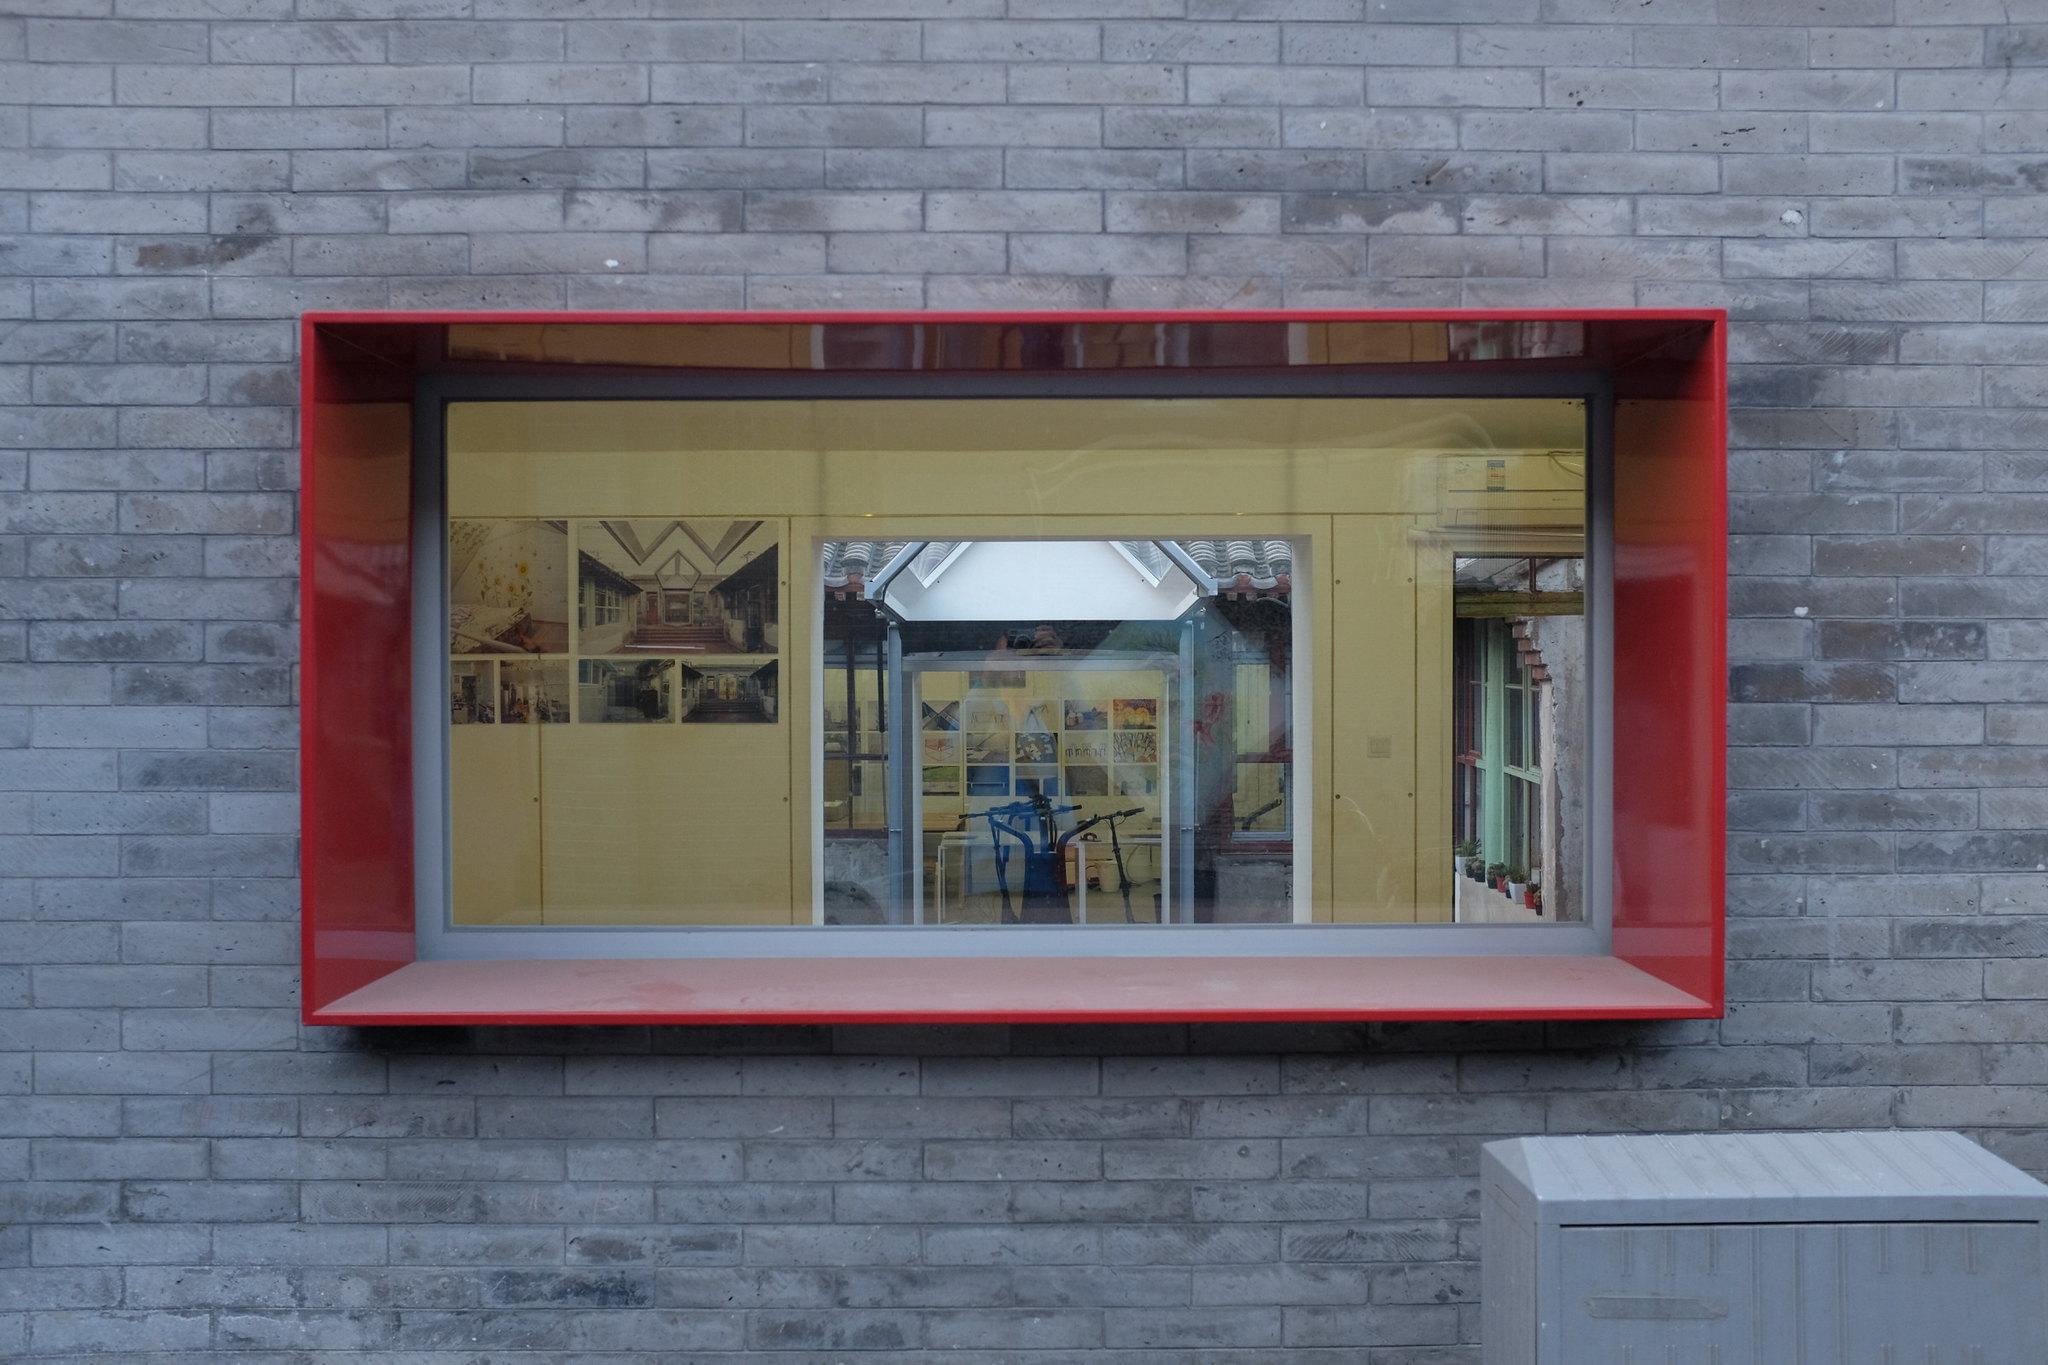 Neue Hutong-Architektur